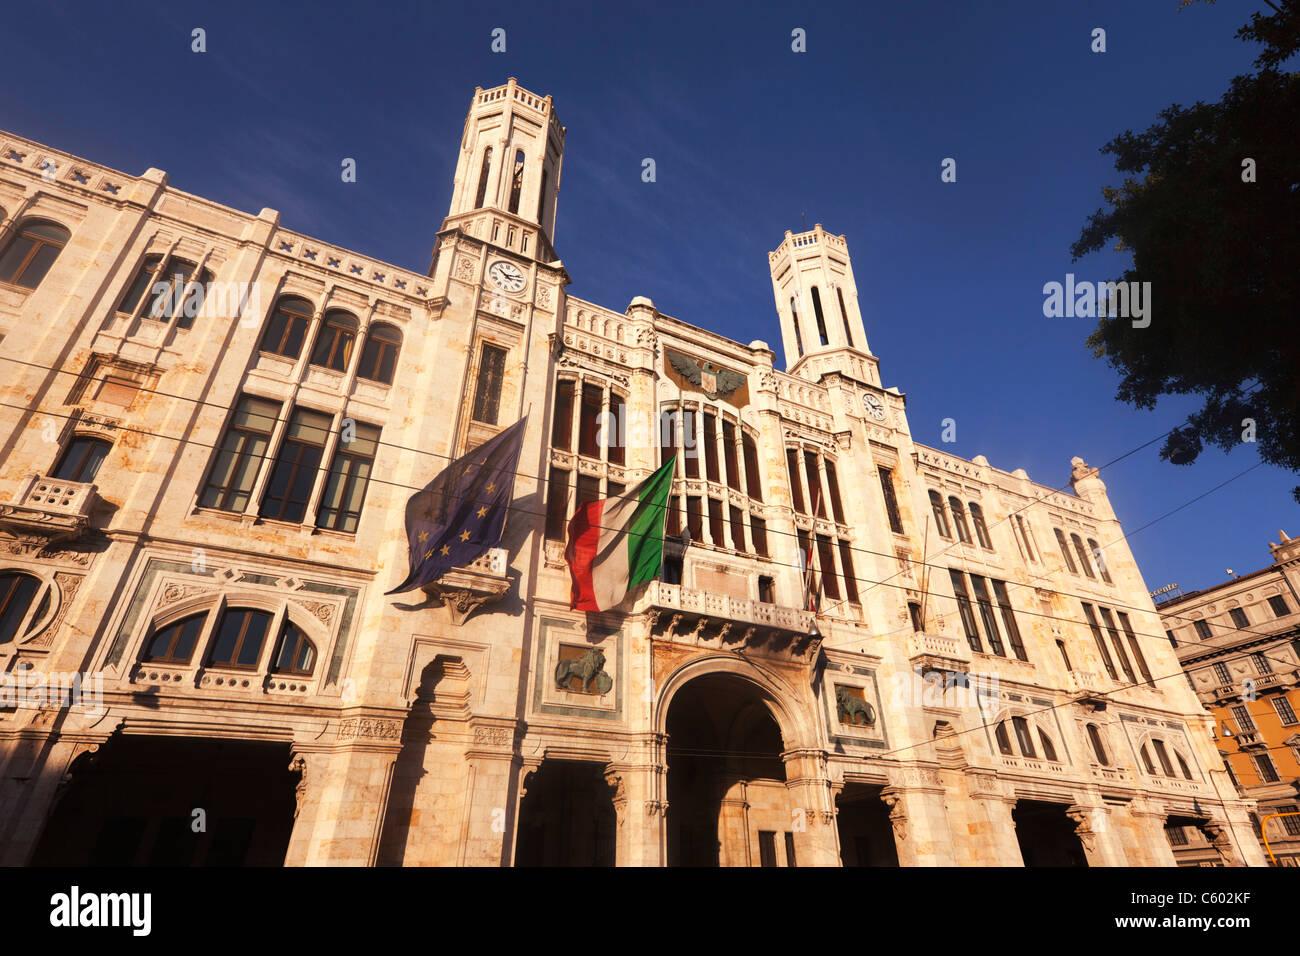 Ts44 stockfotos ts44 bilder alamy for Sardinien design hotel